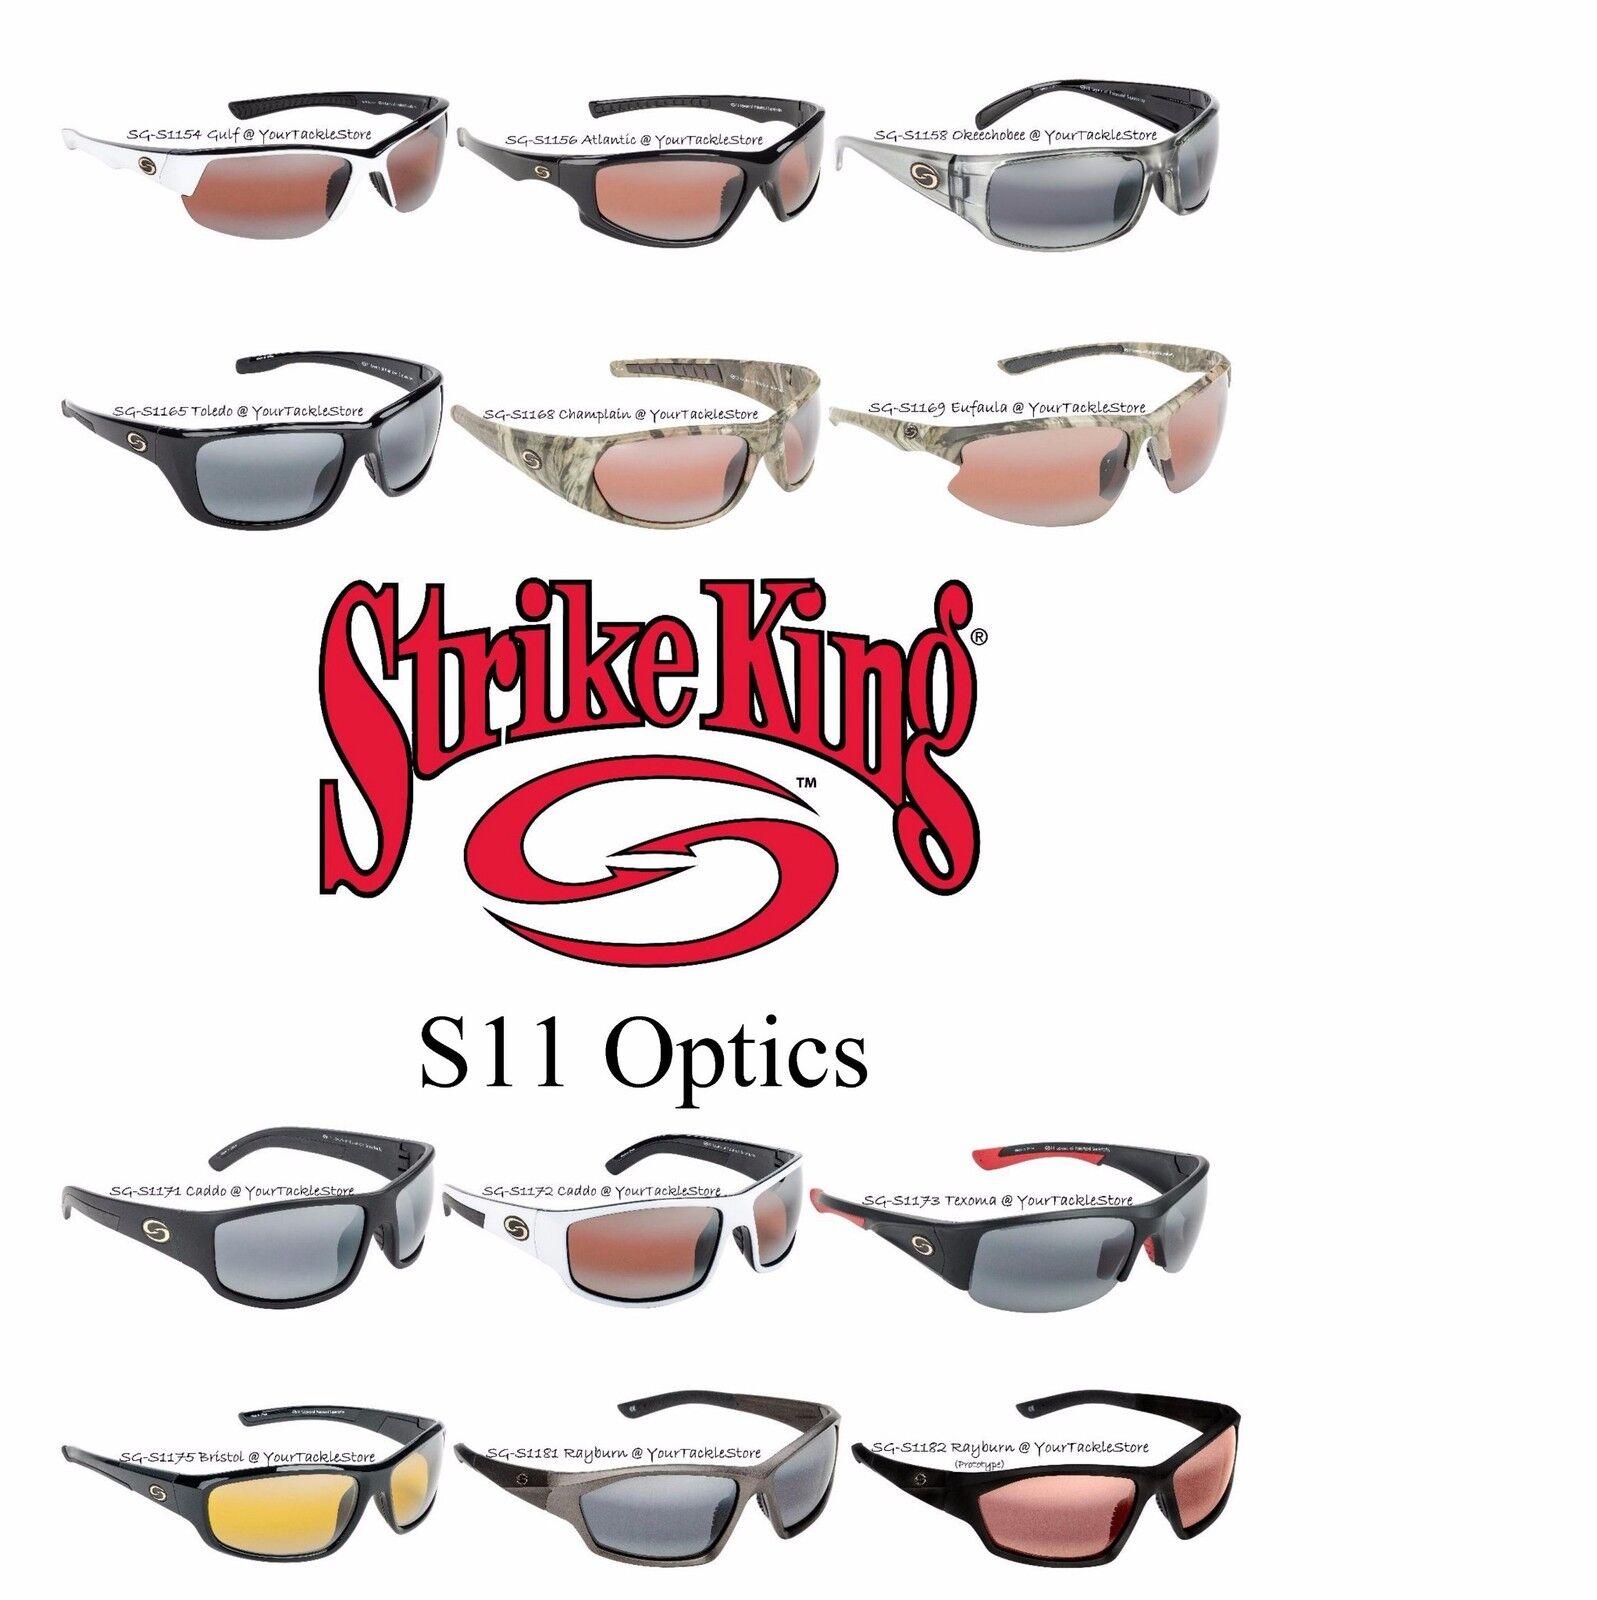 3518fa023ba Strike King Lures S11 Optics Sunglasses for sale online